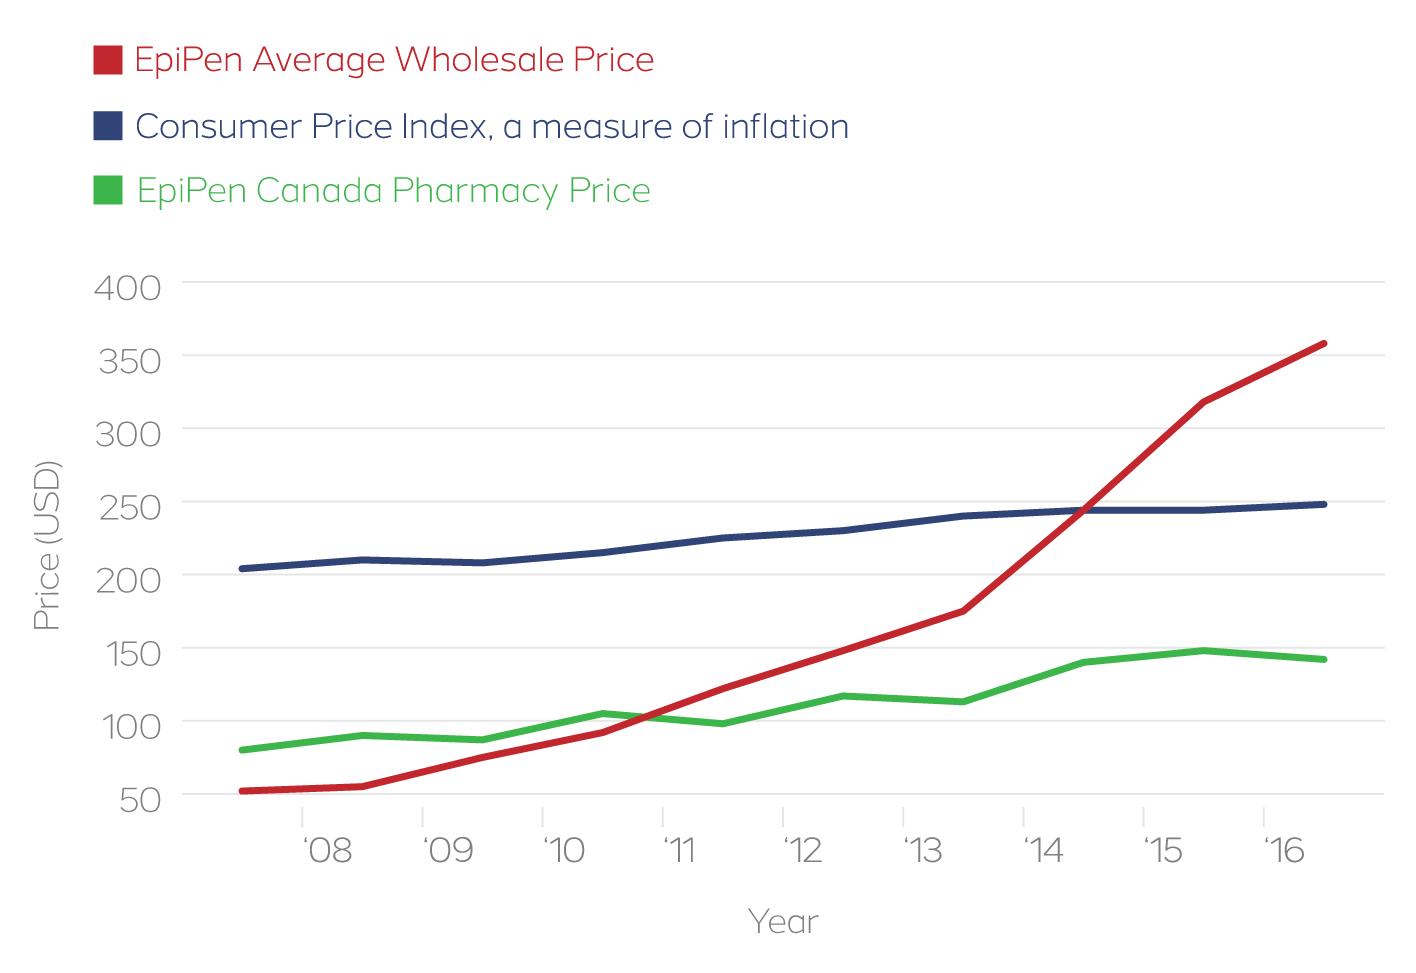 Where to buy EpiPen 2017